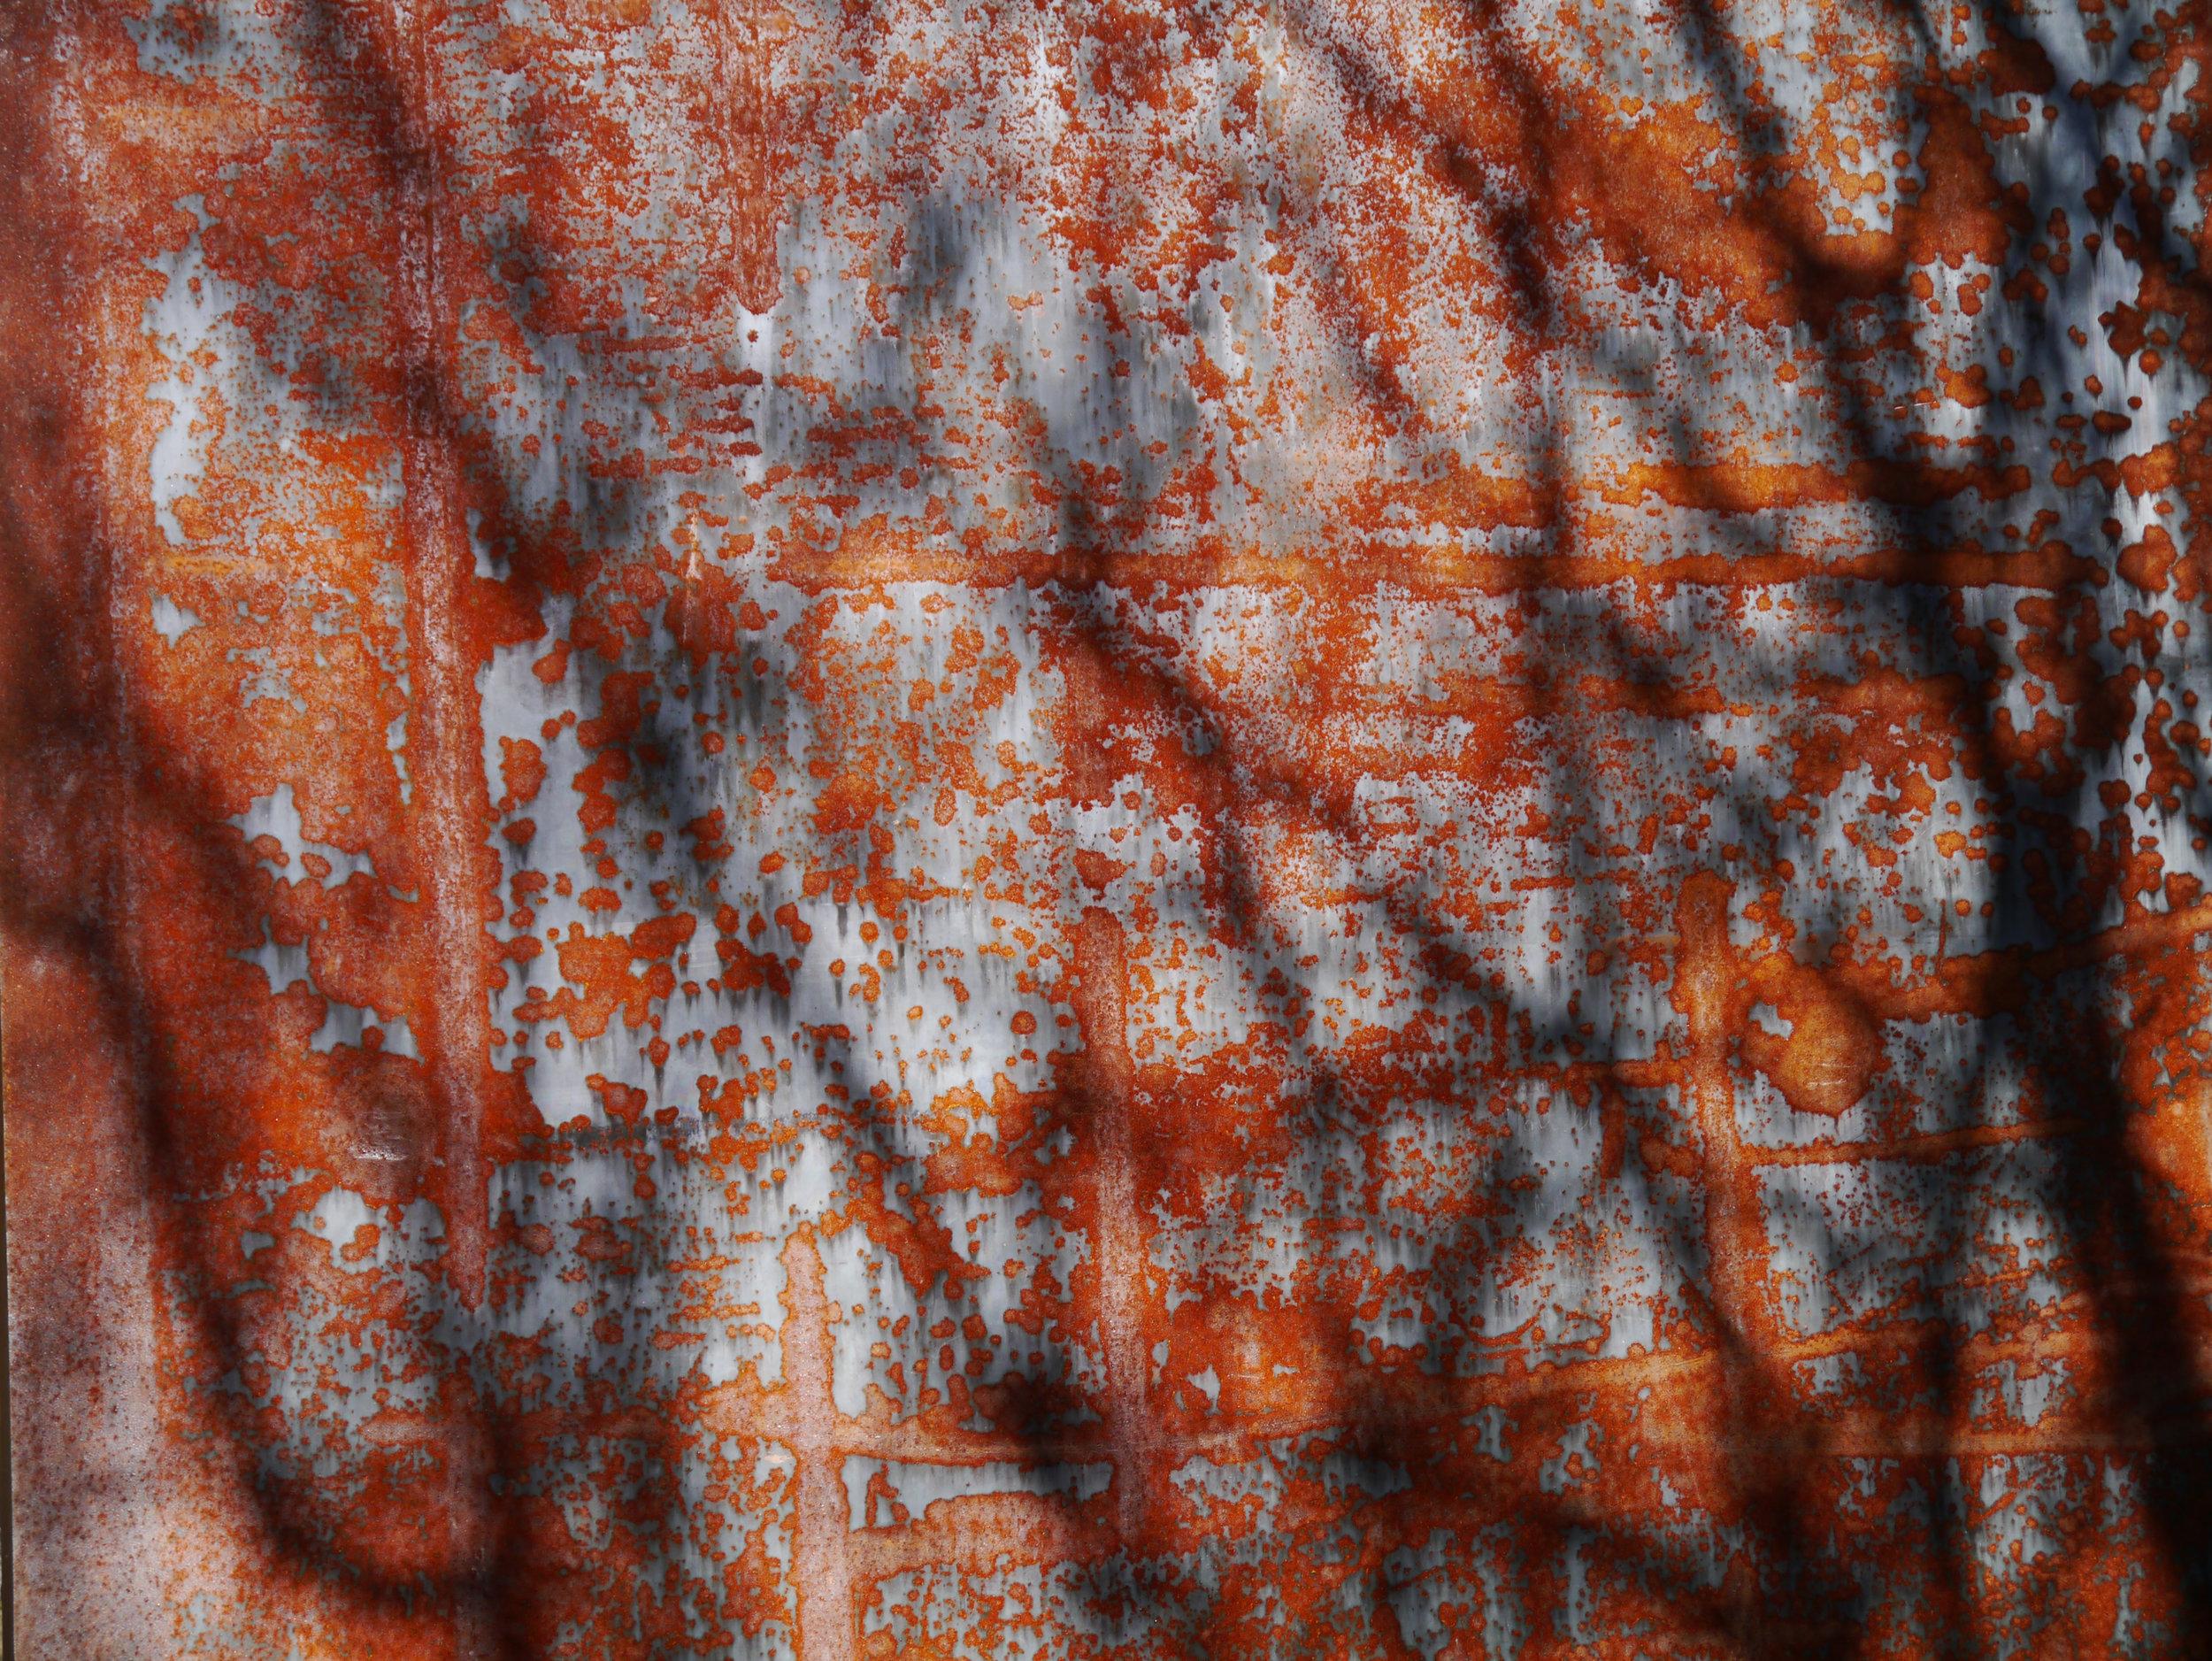 Dappled light through trees on rusted weathered steel sculpture - Richard Serra Walking is Measuring, 2000 Corten steel (2 elements) 532 x 244 x 15 cm; 386 x 244 x 15 cm Coll. Fundação de Serralves — Museu de Arte Contemporânea, Porto